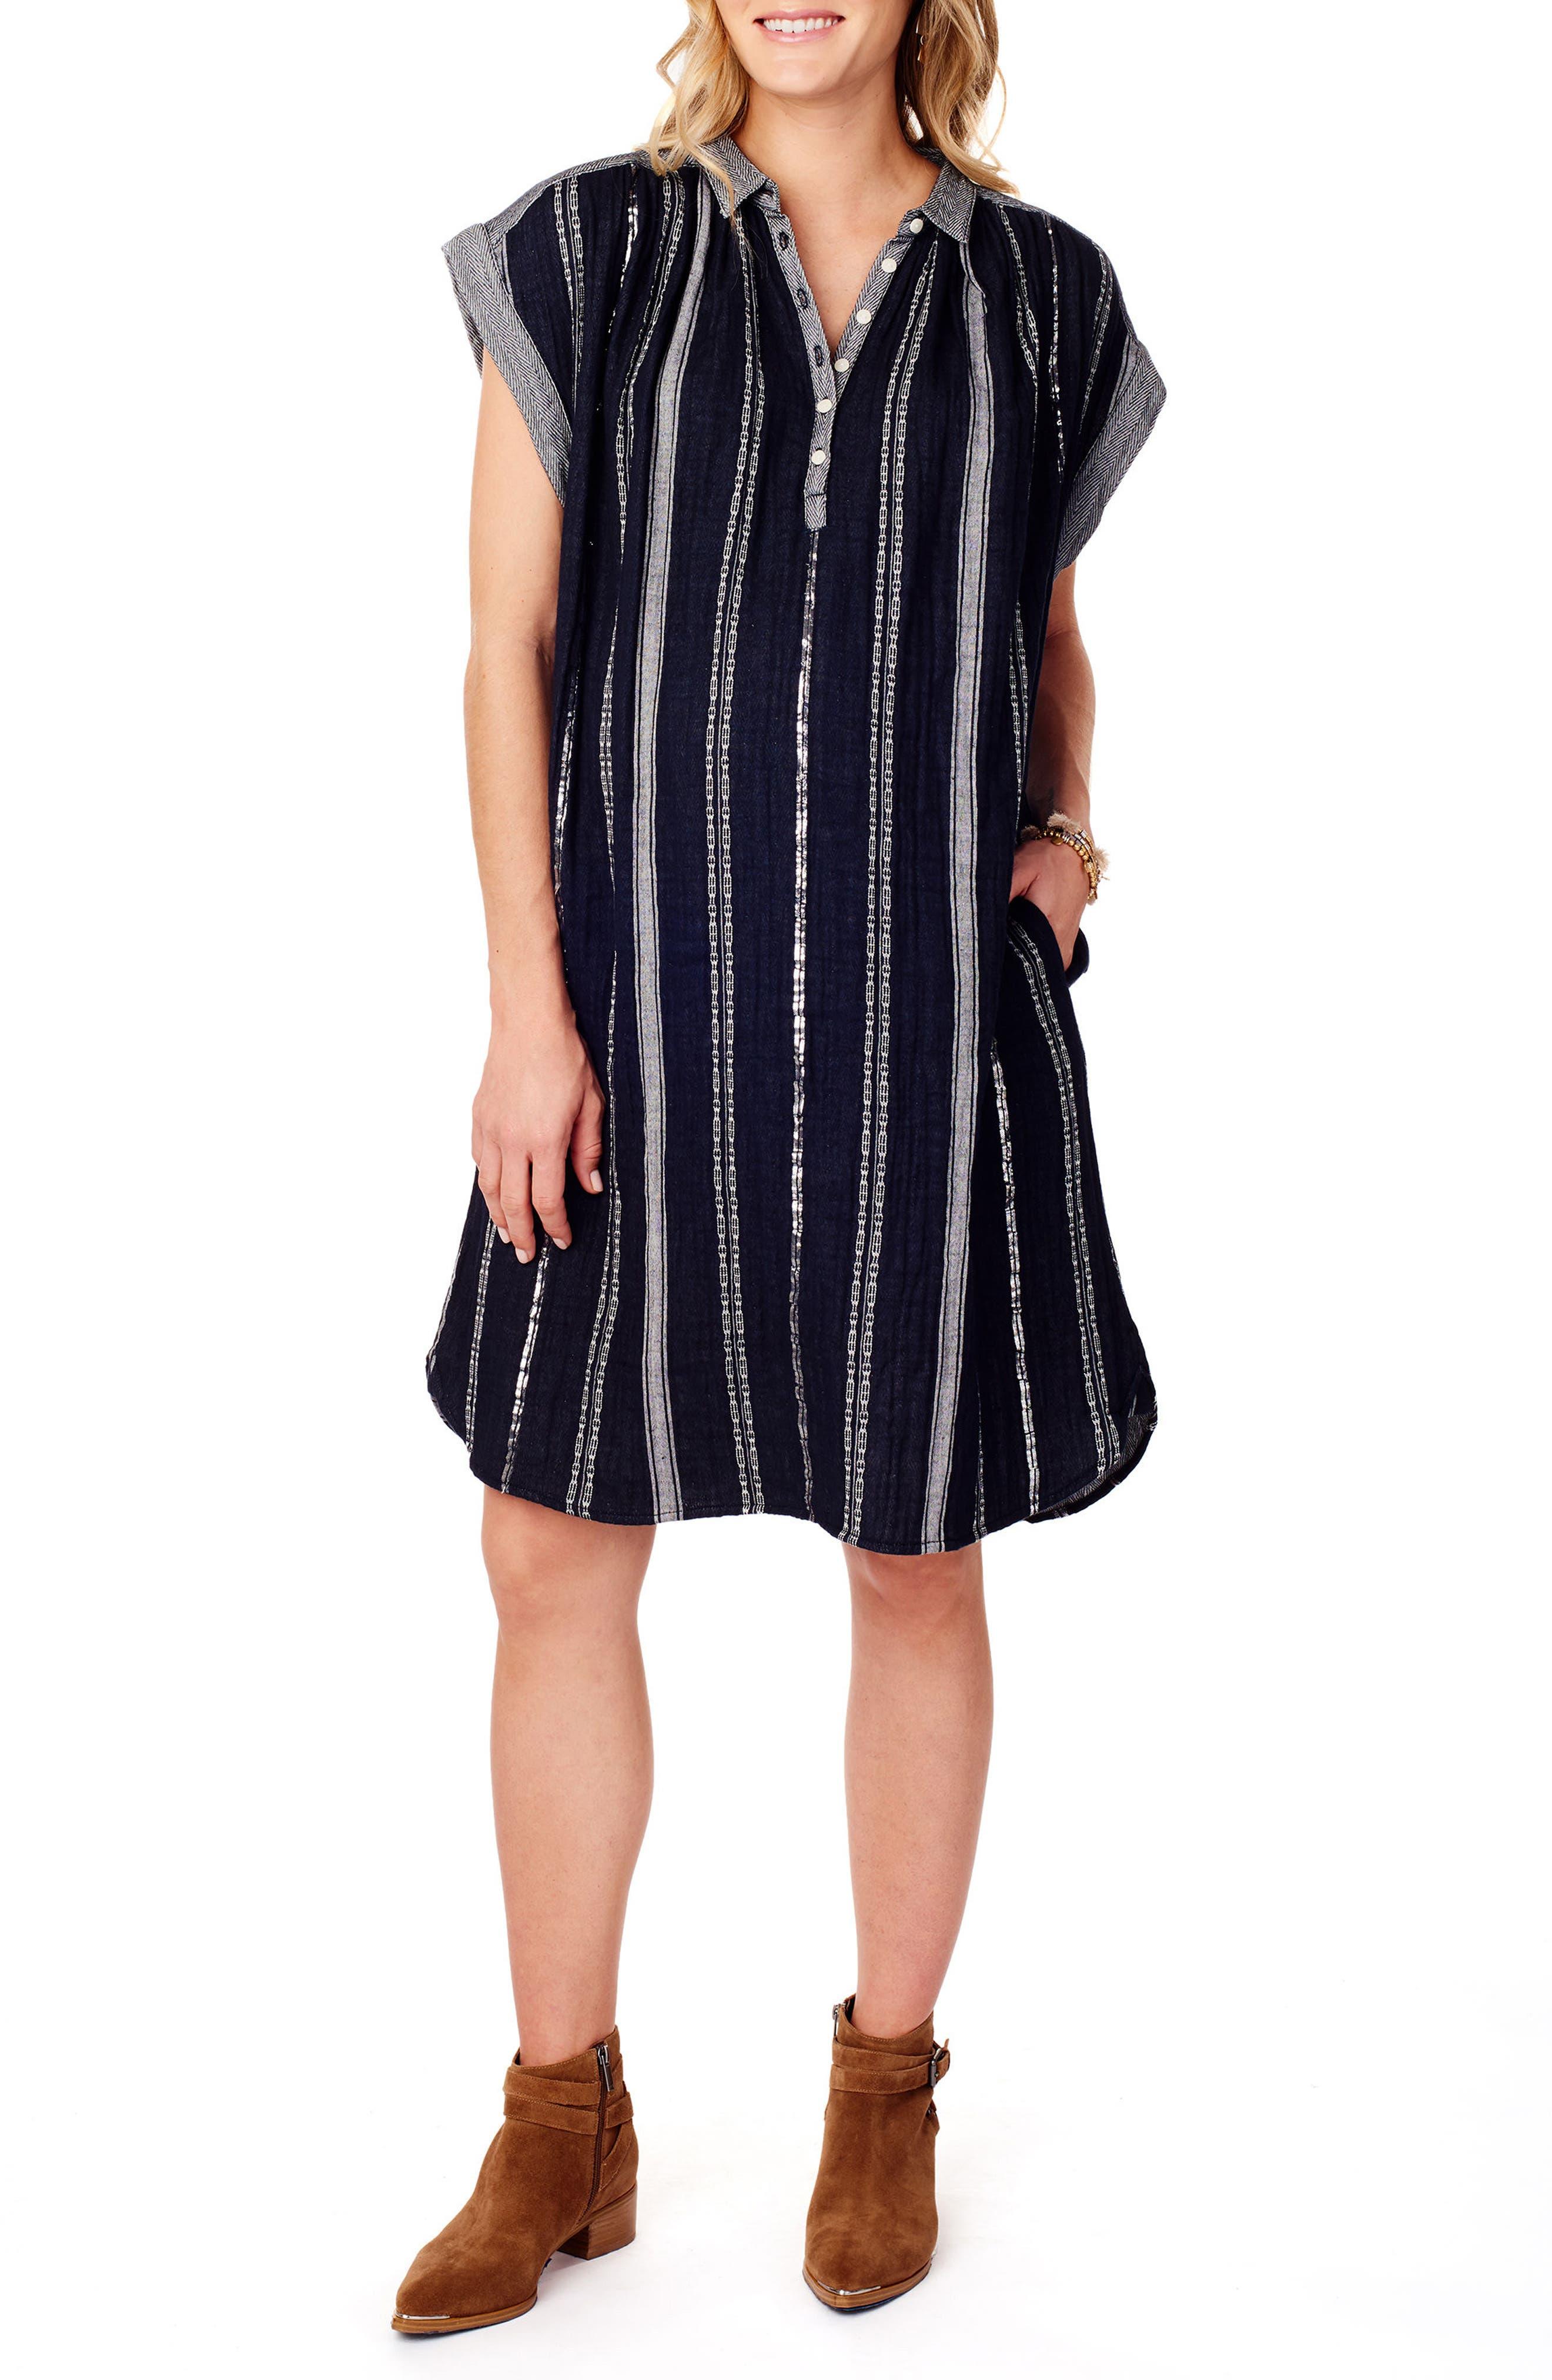 Ingrid & Isabel Maternity Shift Dress,                             Main thumbnail 1, color,                             True Navy Lurex Stripe